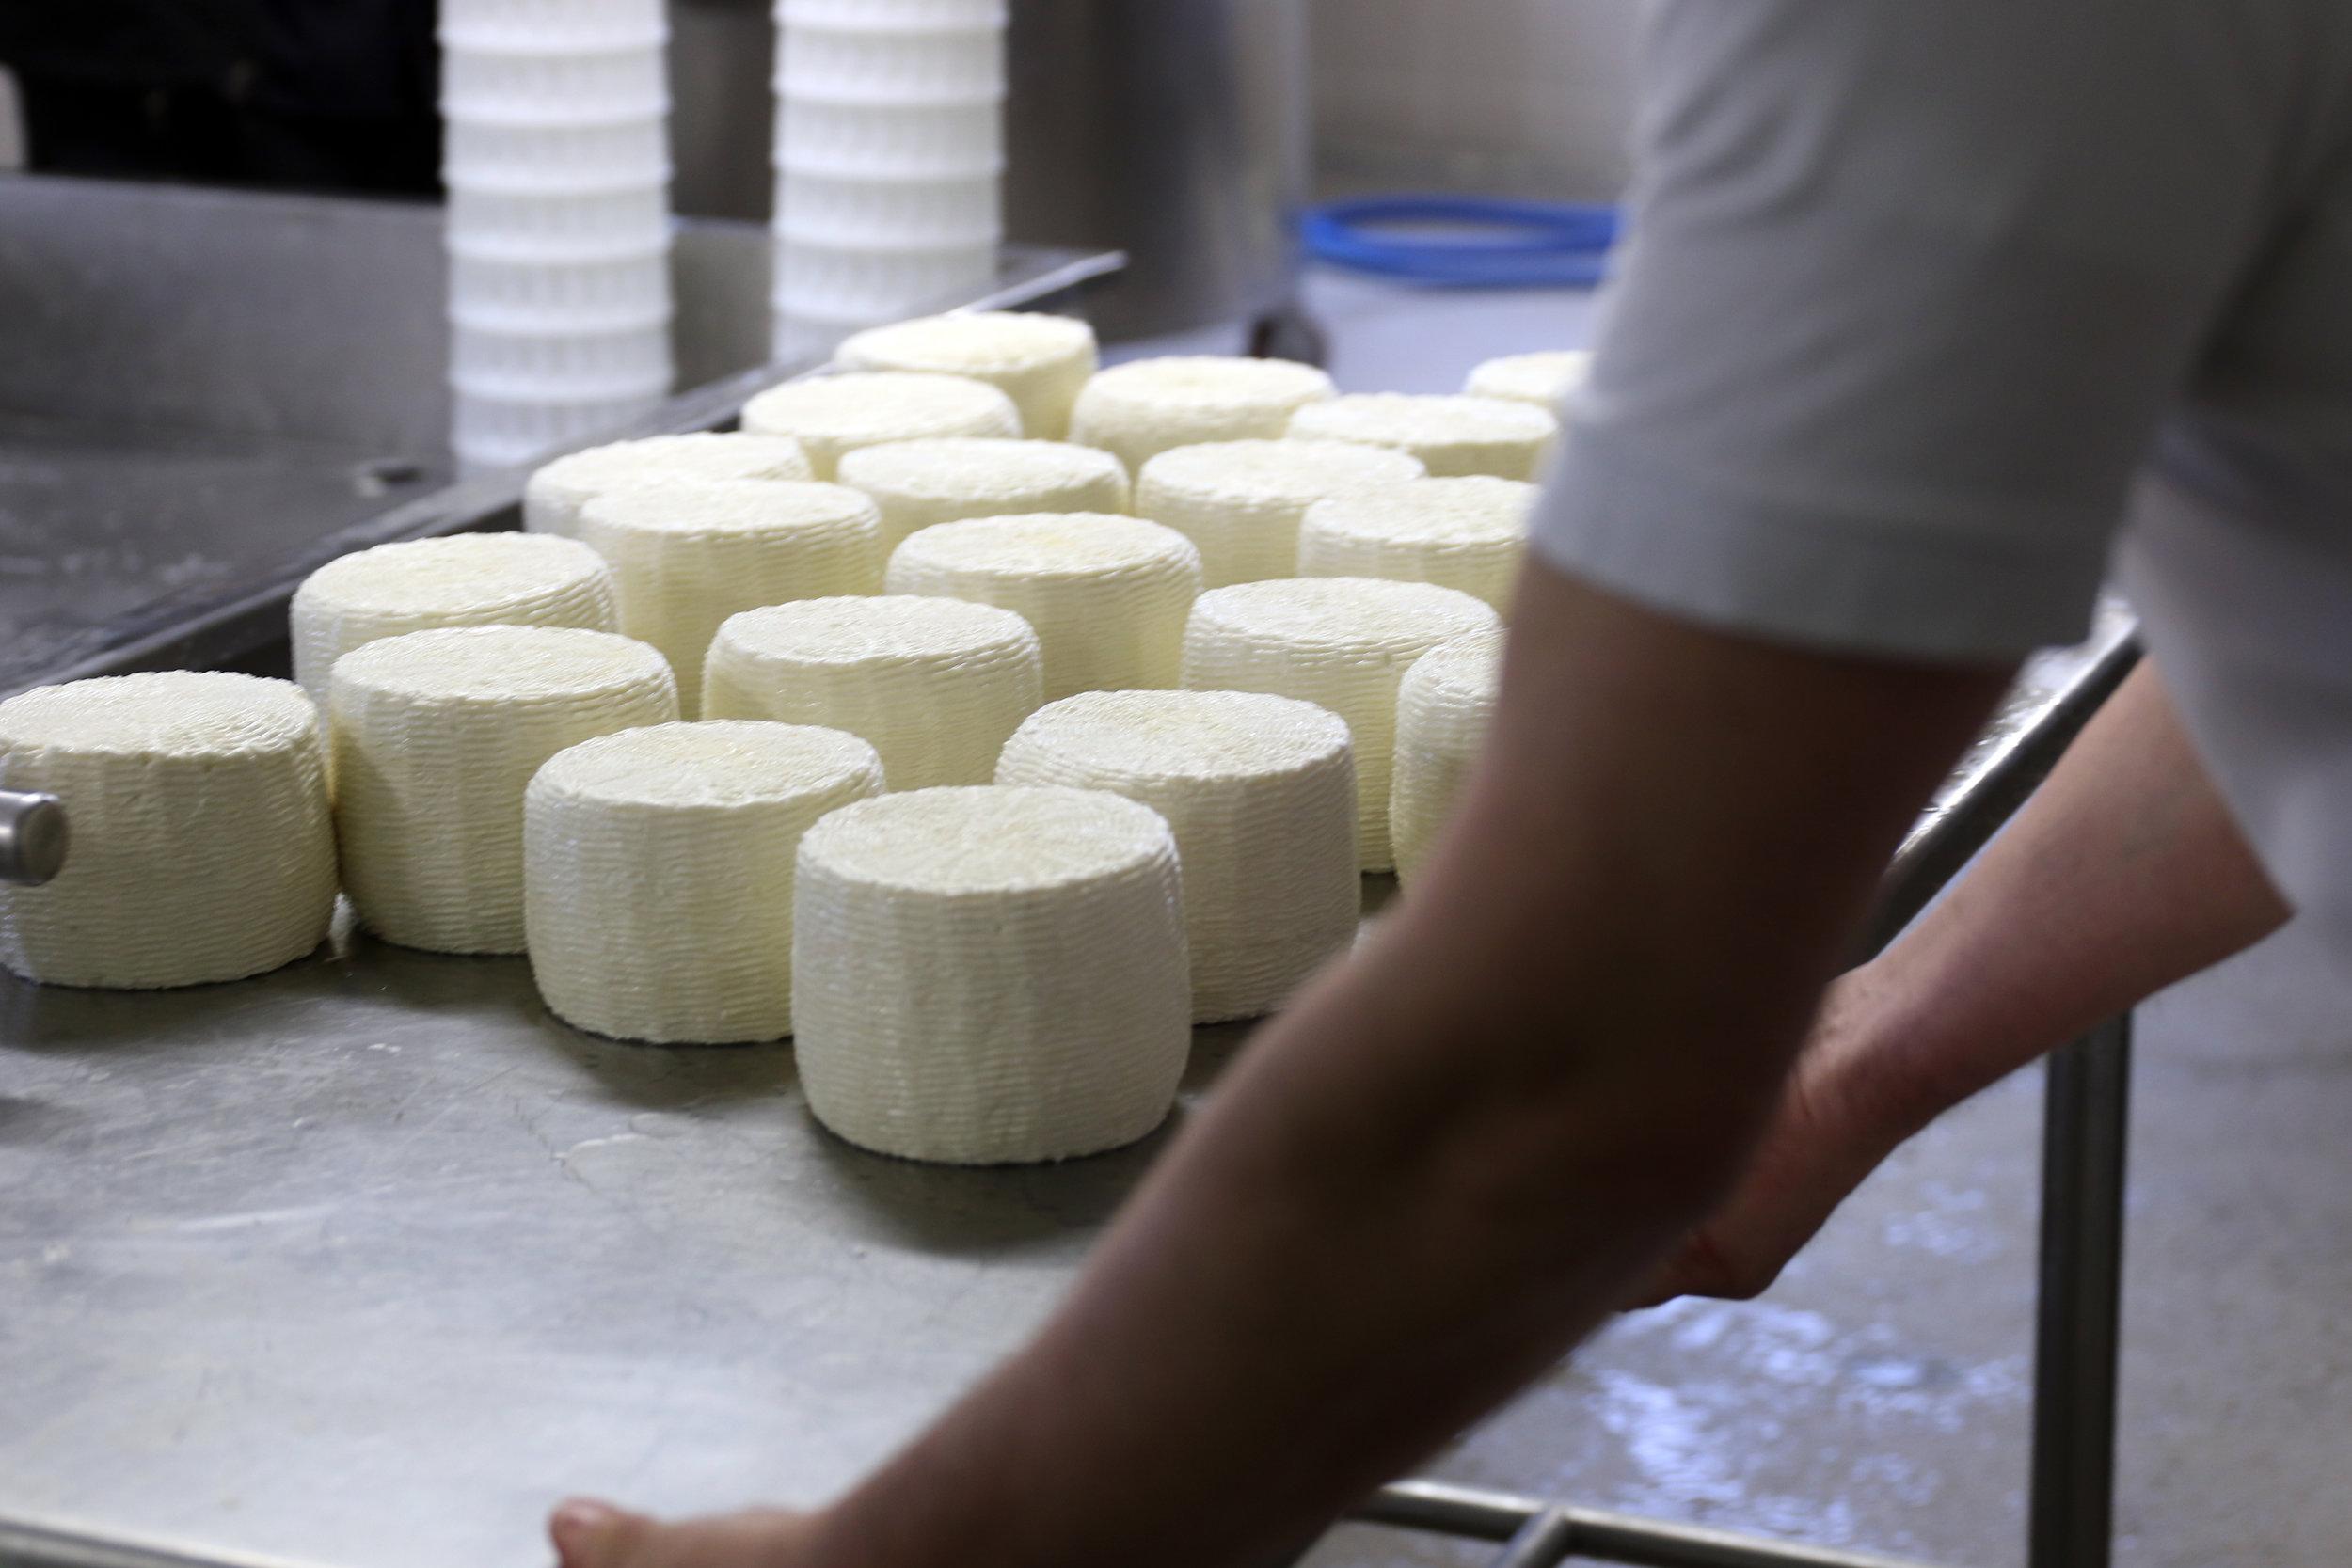 trips-2017-italy-atalanta-veneto-asiago-waister-farm-traditional-farmstead-cheese-maker-raw-milk-280A4420.jpg